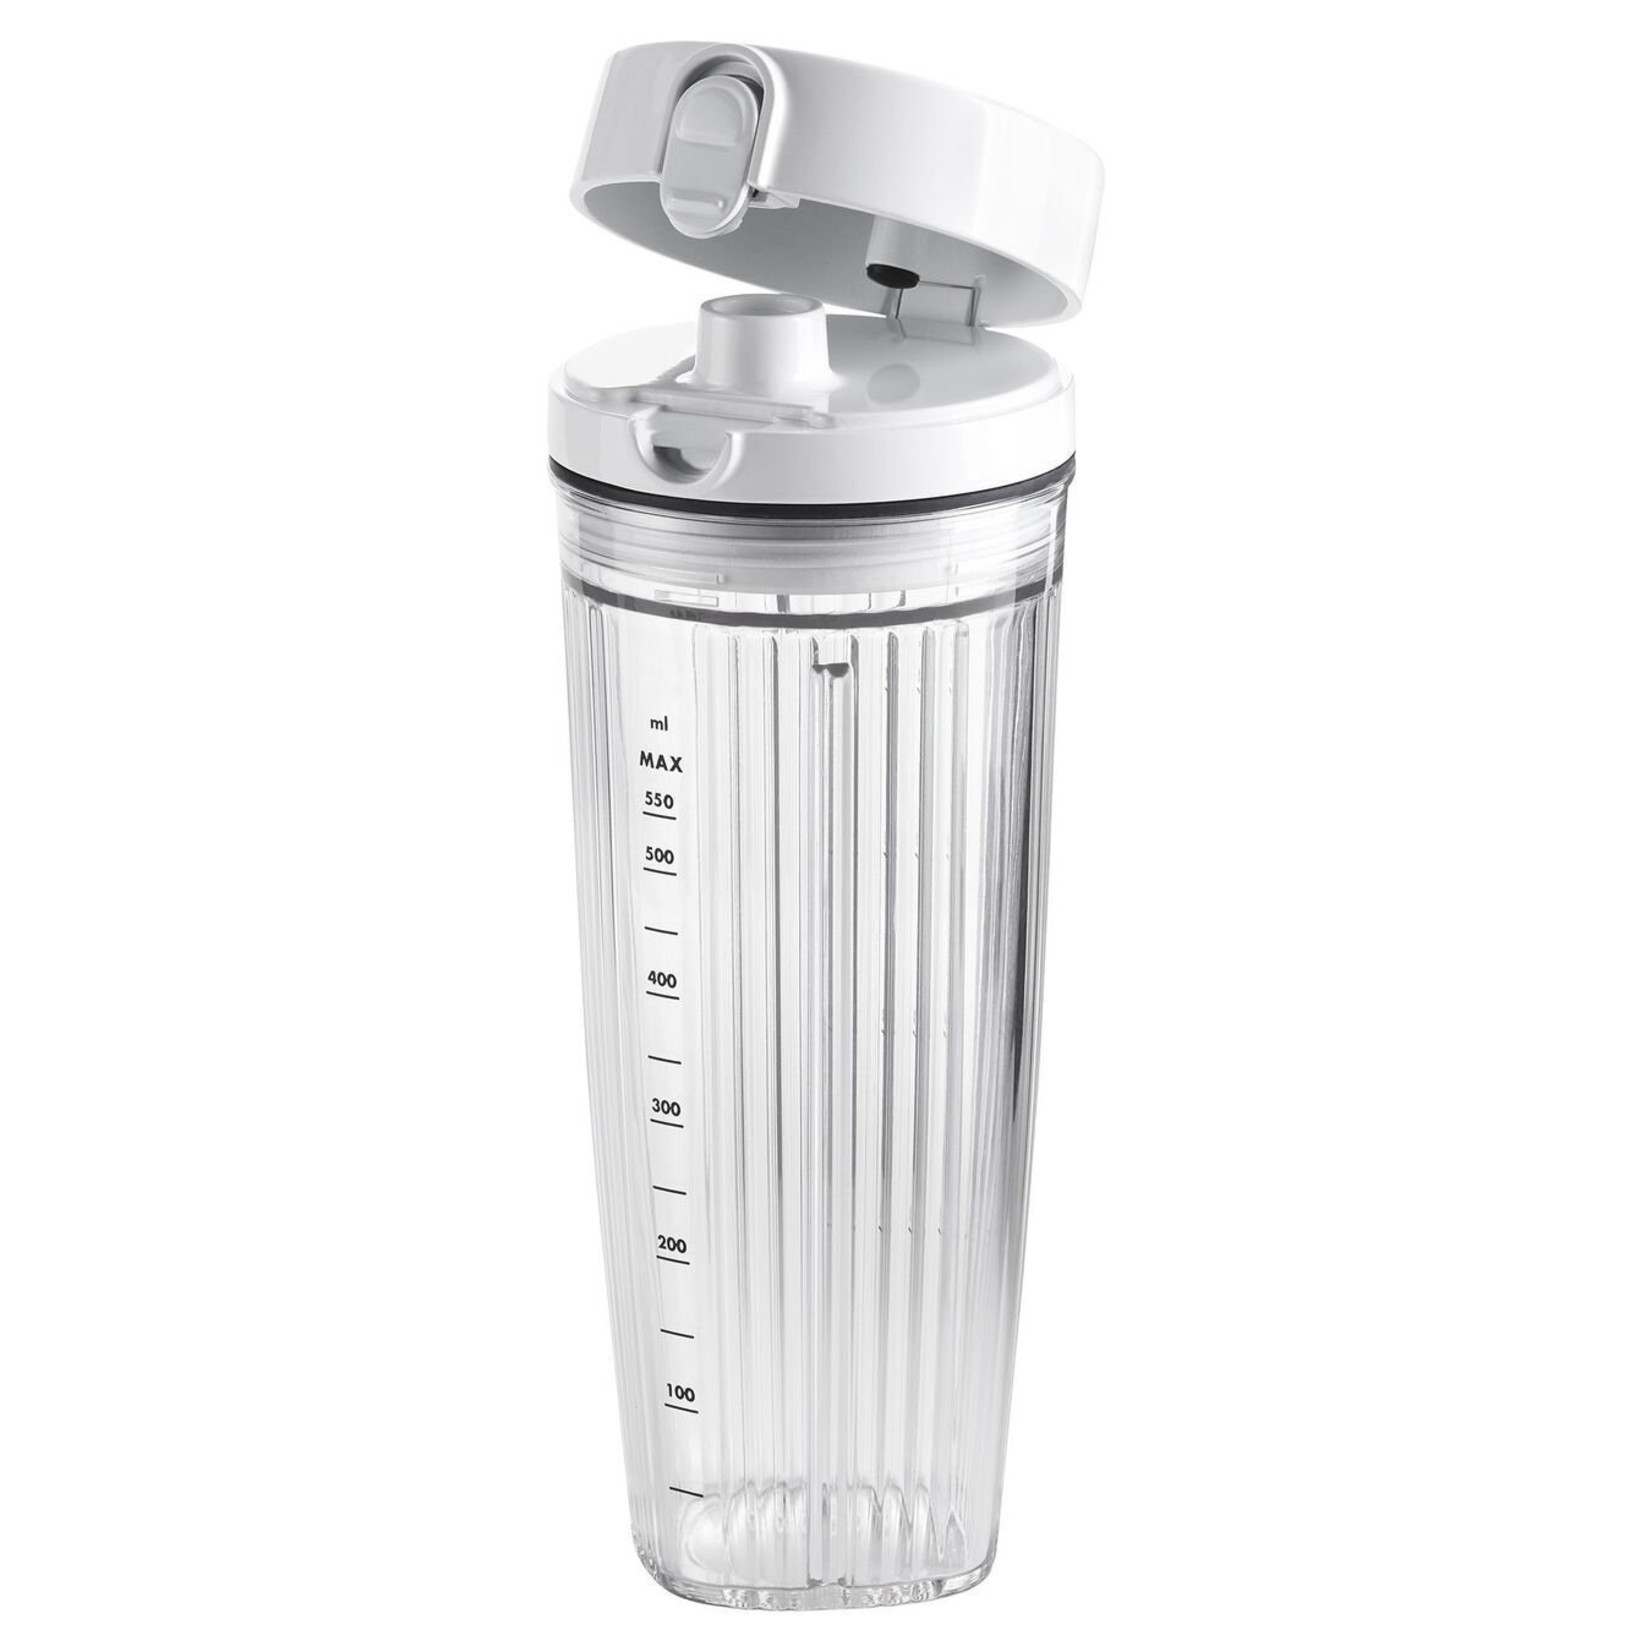 Zwilling Zwilling blender 53003-000-0 Inclusief drinkbekerdeksel